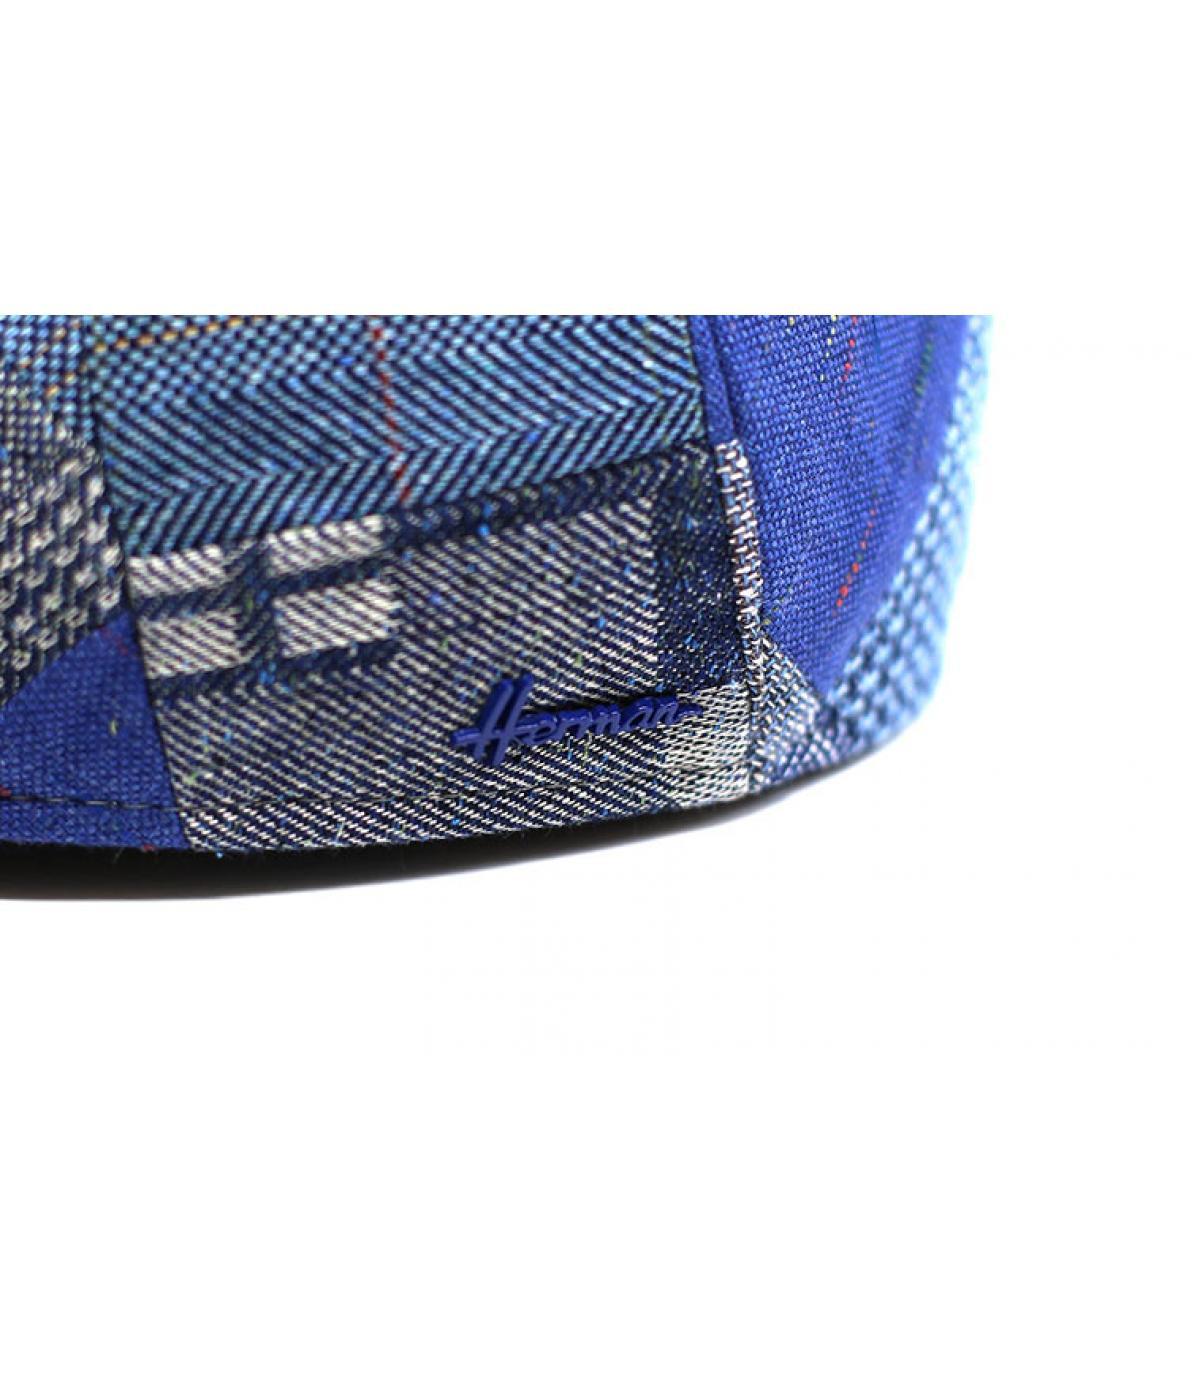 Details Boxer Patch blue - Abbildung 3